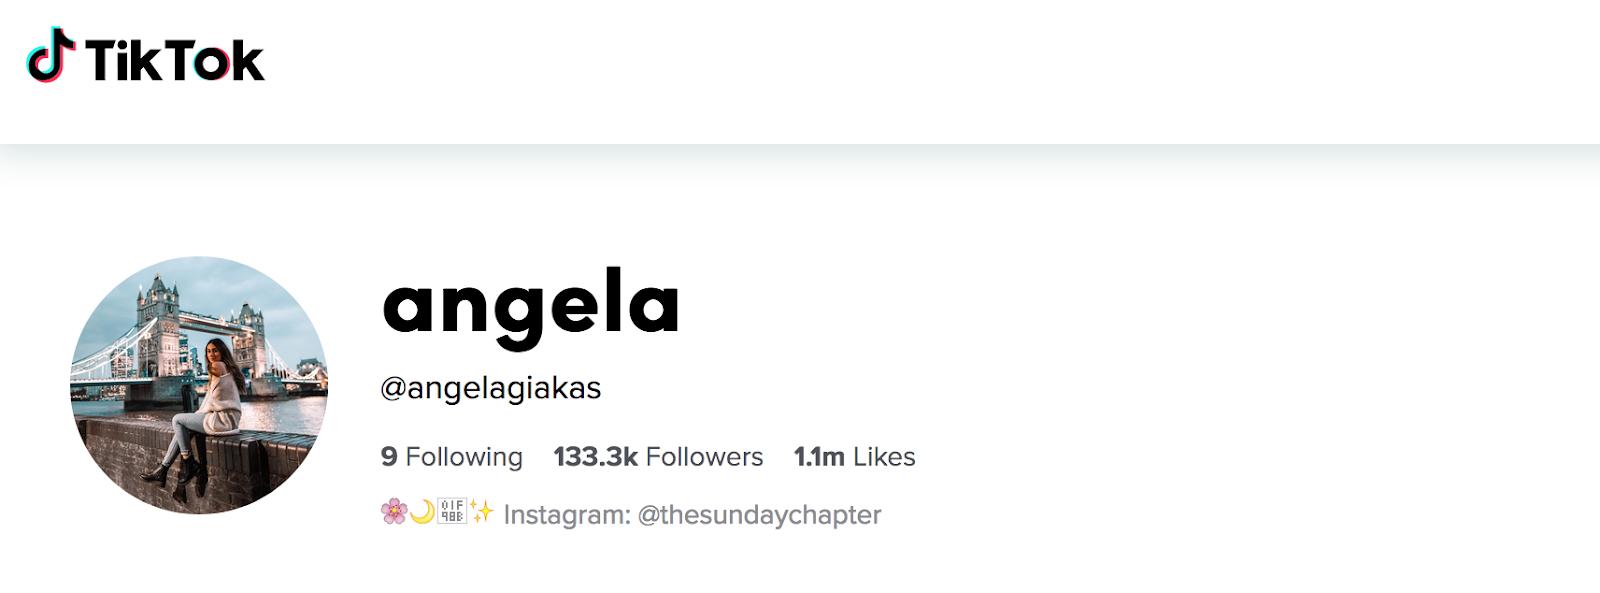 Travel influencers on TikTok - Angela